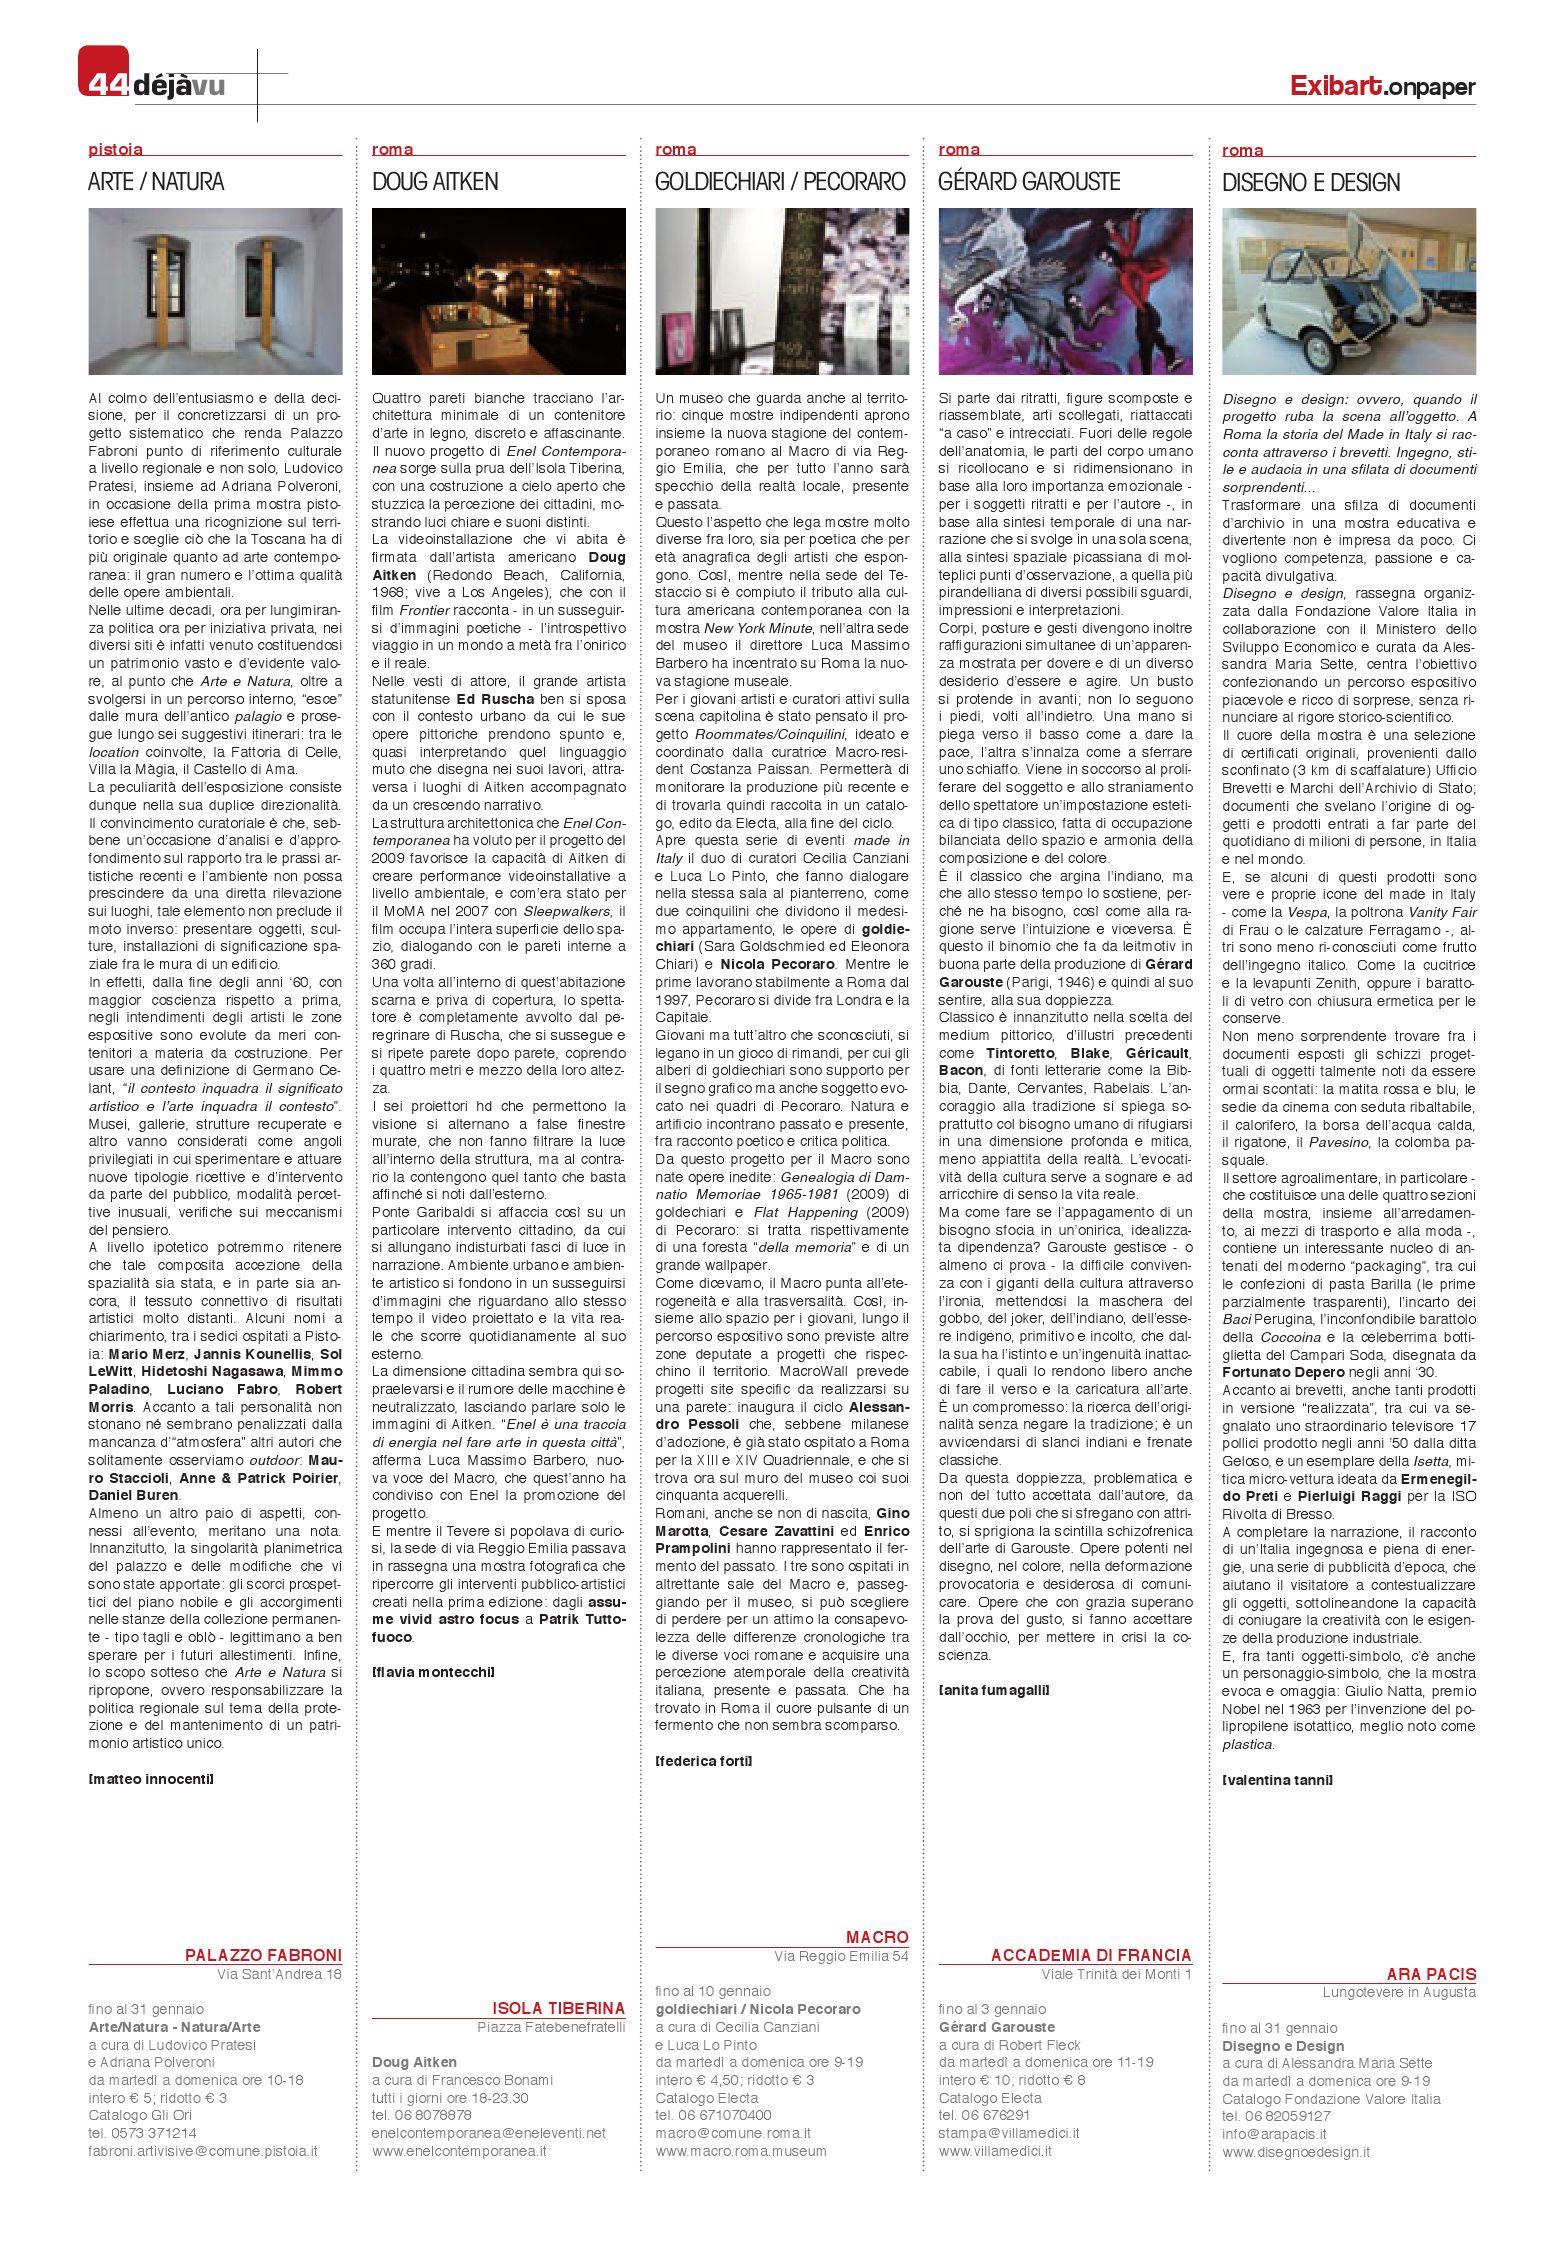 Exibart.onpaper n.82 by Exibart srl issuu